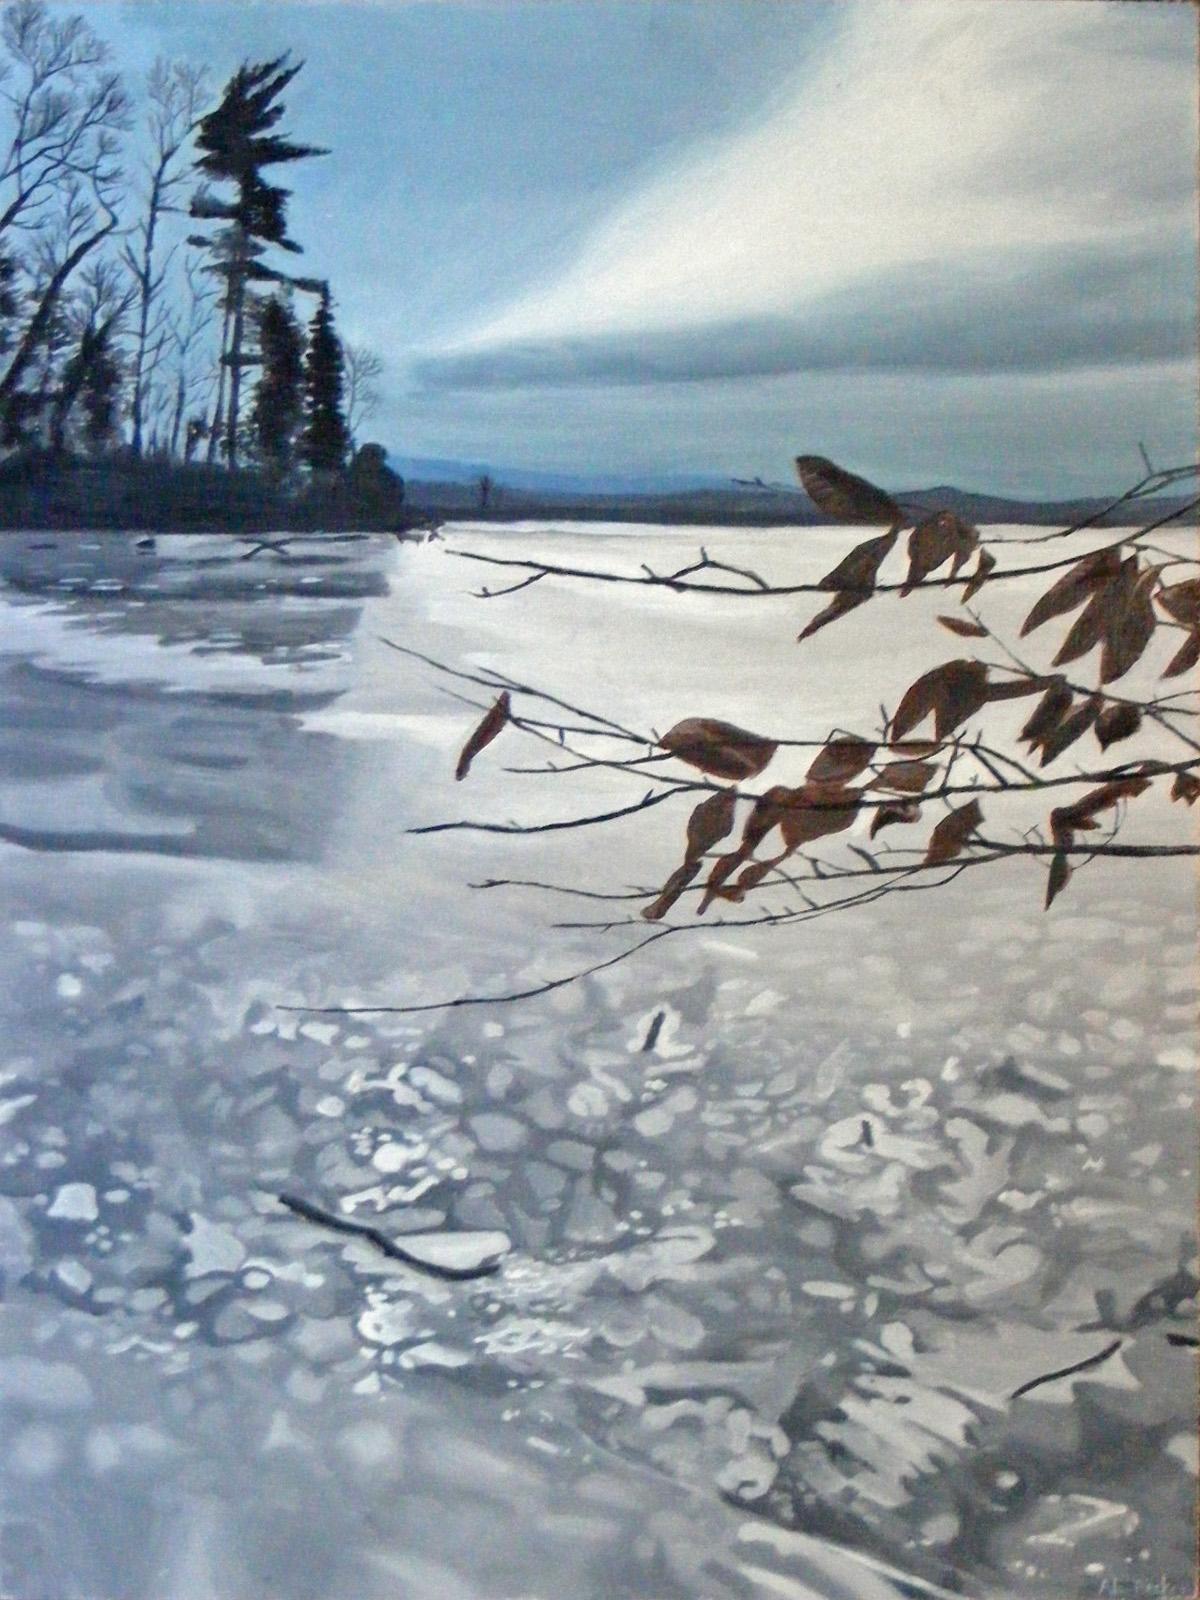 The Frozen Hudson by alanbecker